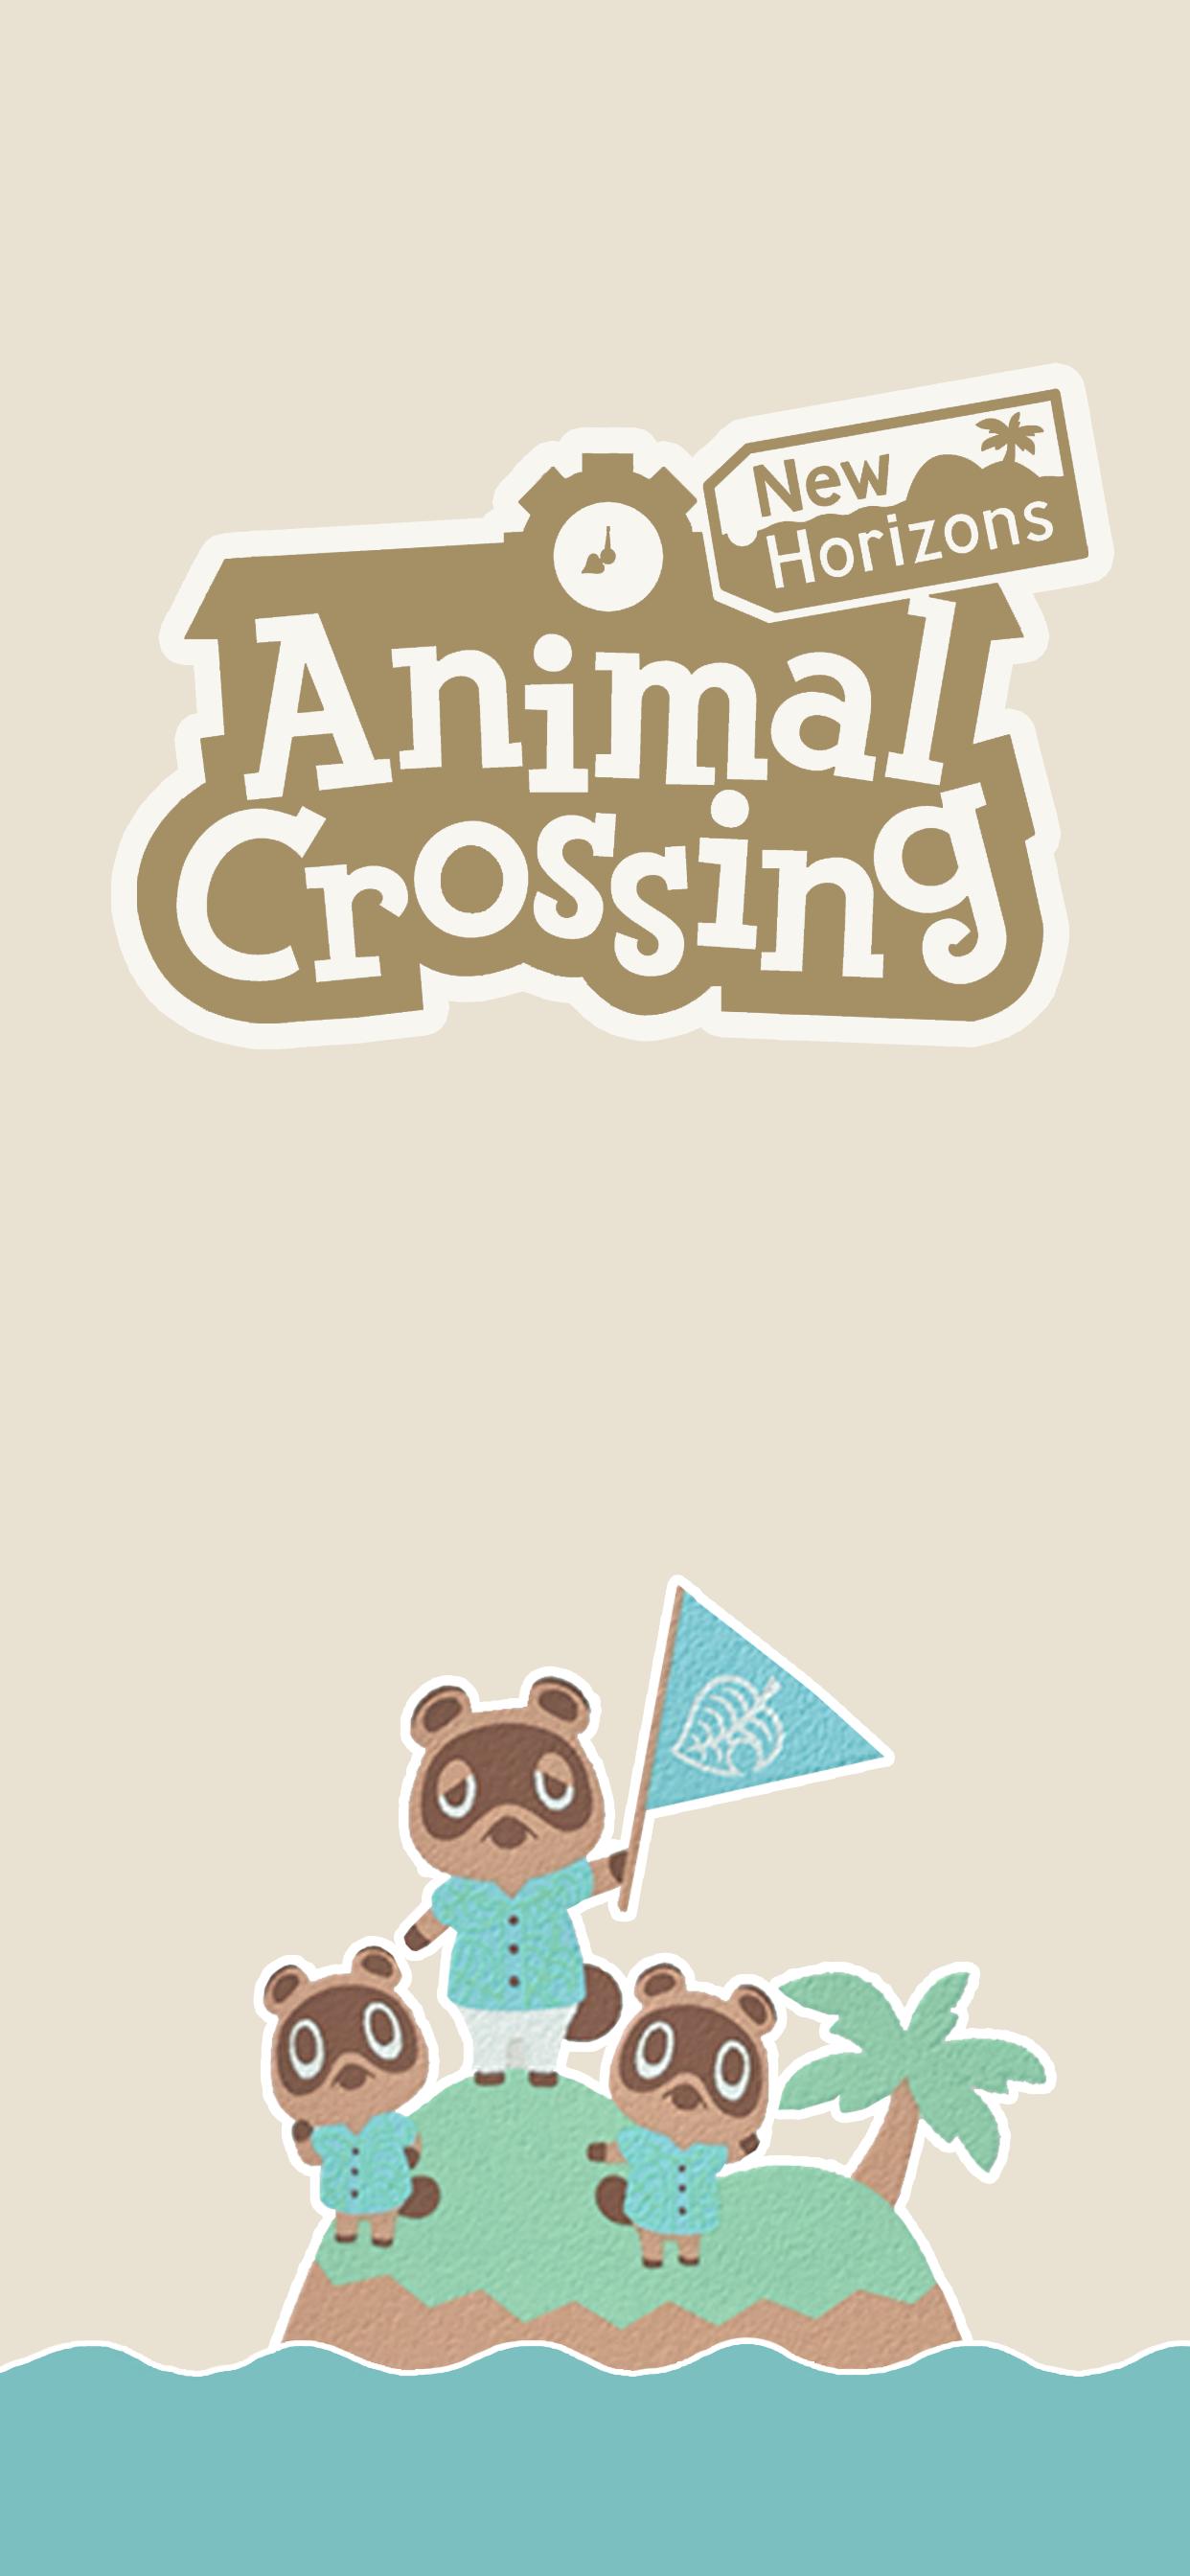 Animal Crossing New Horizons Mobile And Desktop Wallpapers Acpocketnews Animal Crossing Animal Crossing Cats Animal Crossing Characters